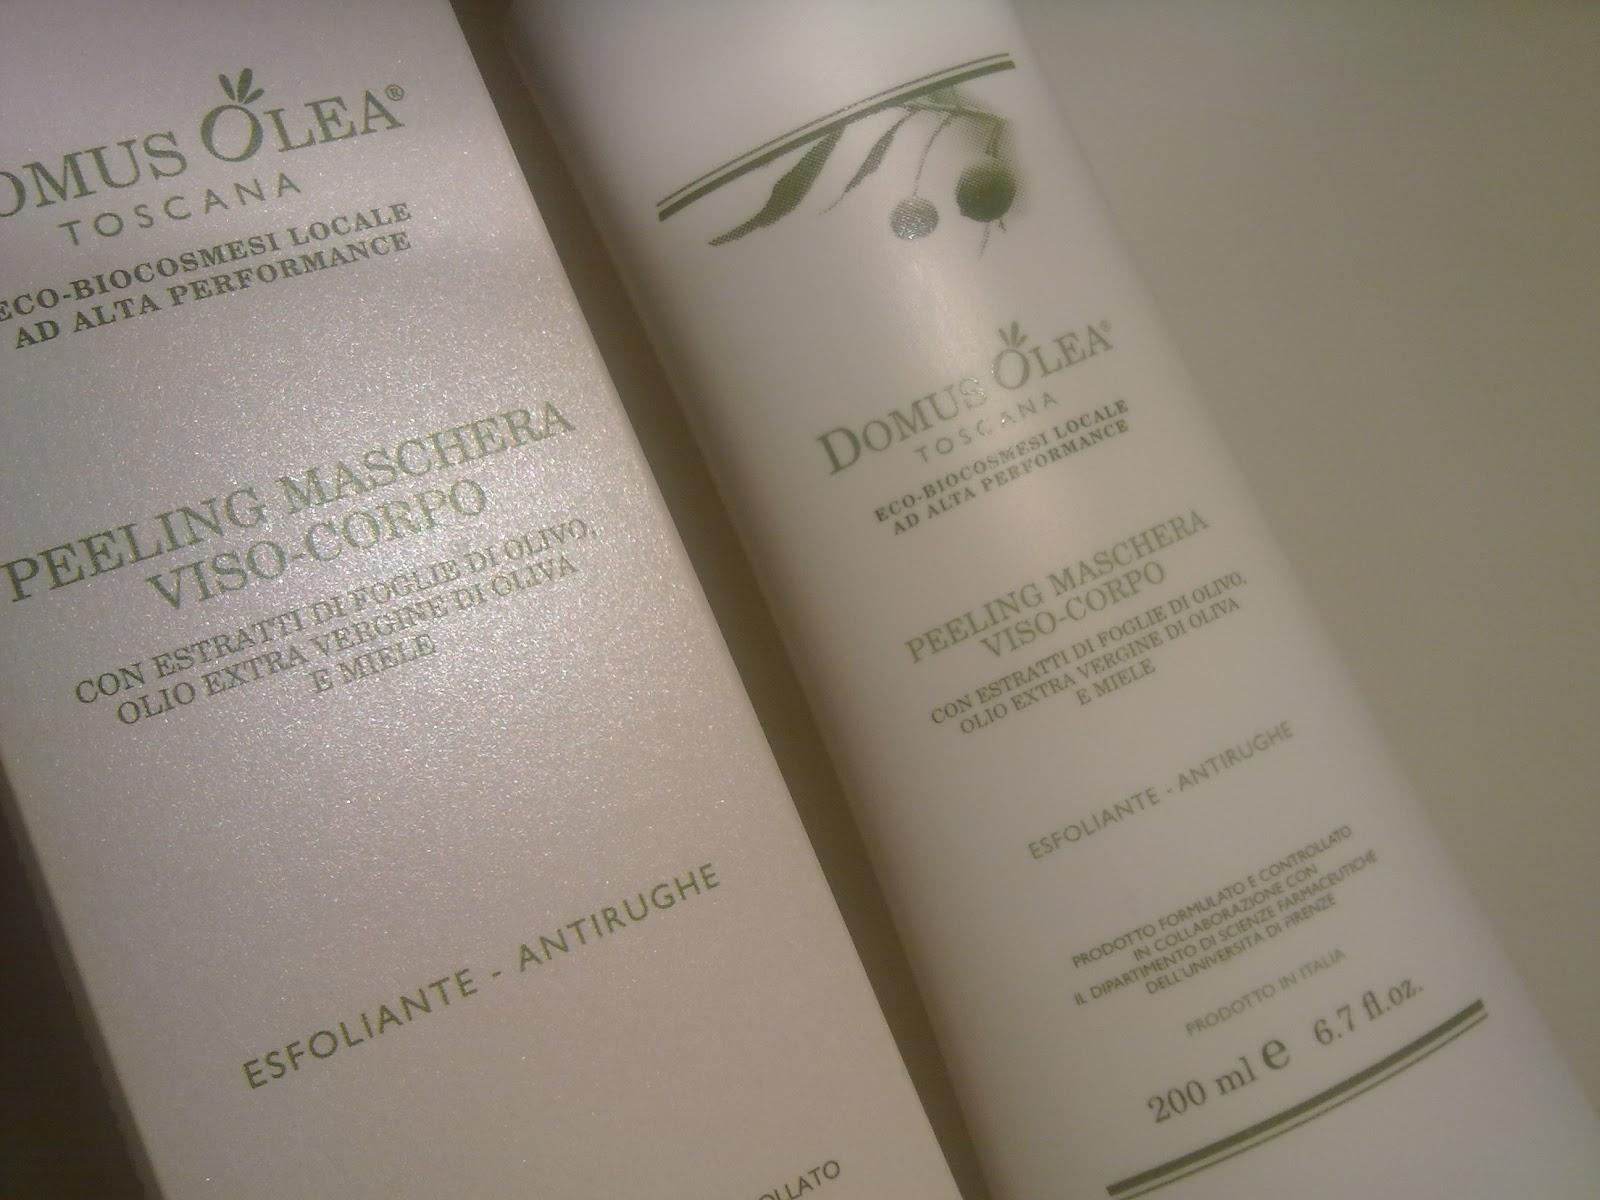 maschera antiage e peeling viso-corpo domus olea toscana_02